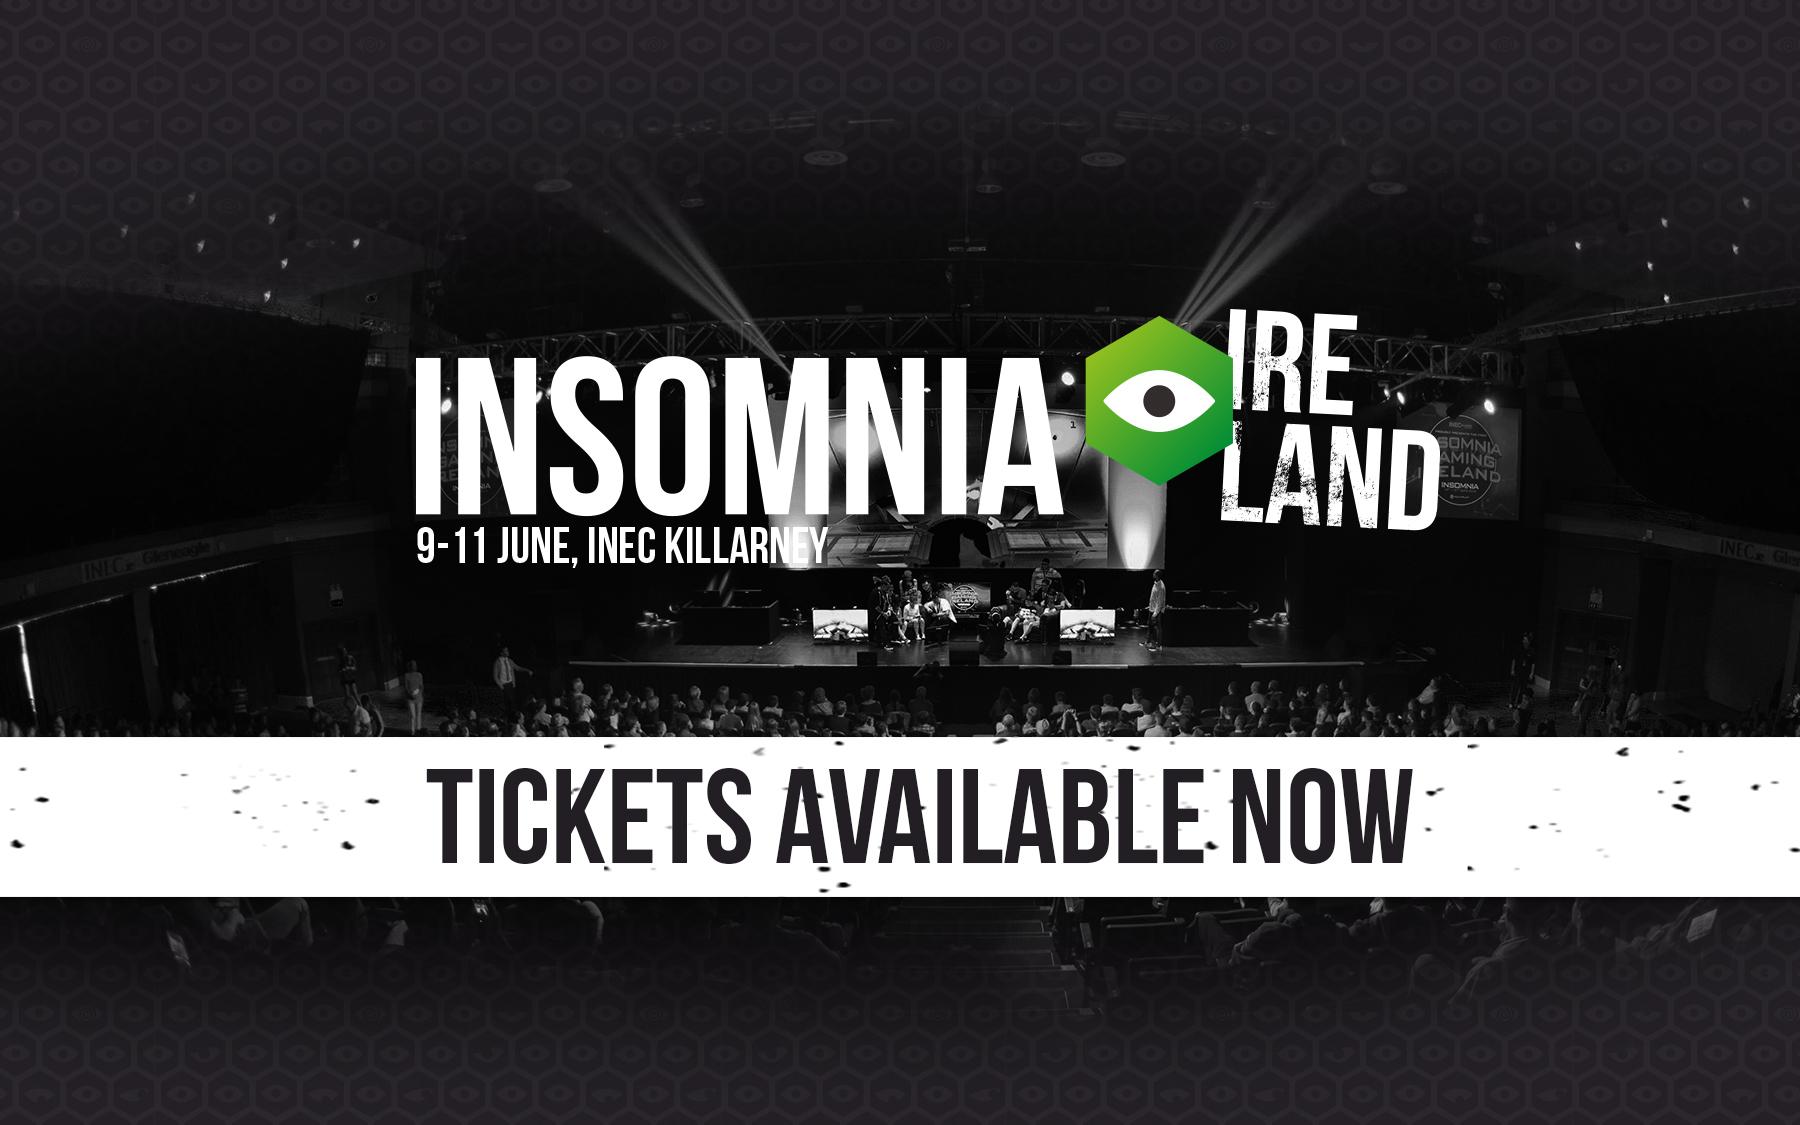 Insomnia Gaming Festival returns to the INEC Killarney